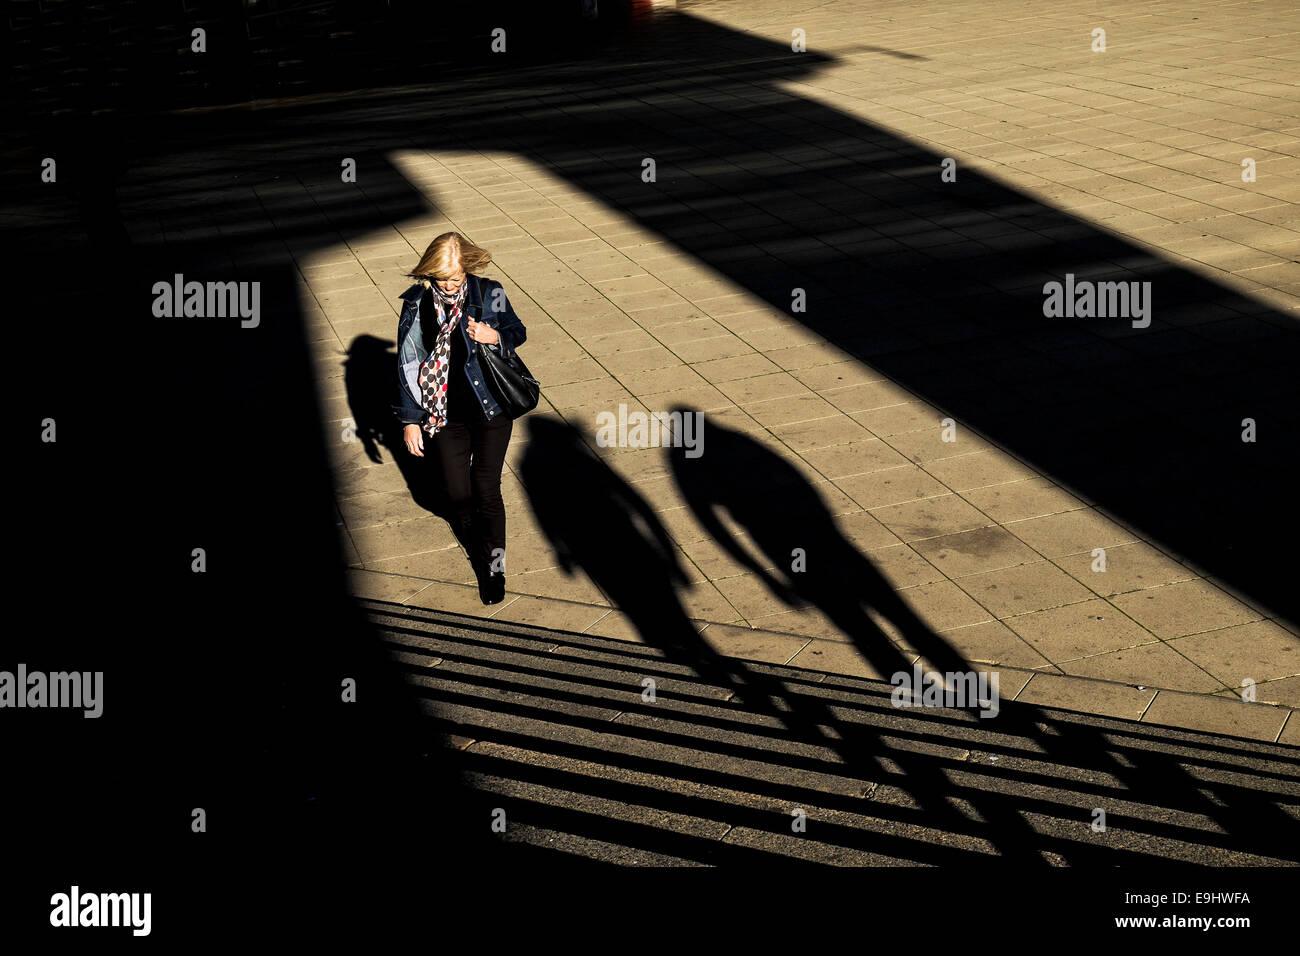 Basildon, Essex, UK. 28 October 2014.  Shoppers walking in unseasonal warm sunshine in Basildon Town Centre.  Photo: - Stock Image